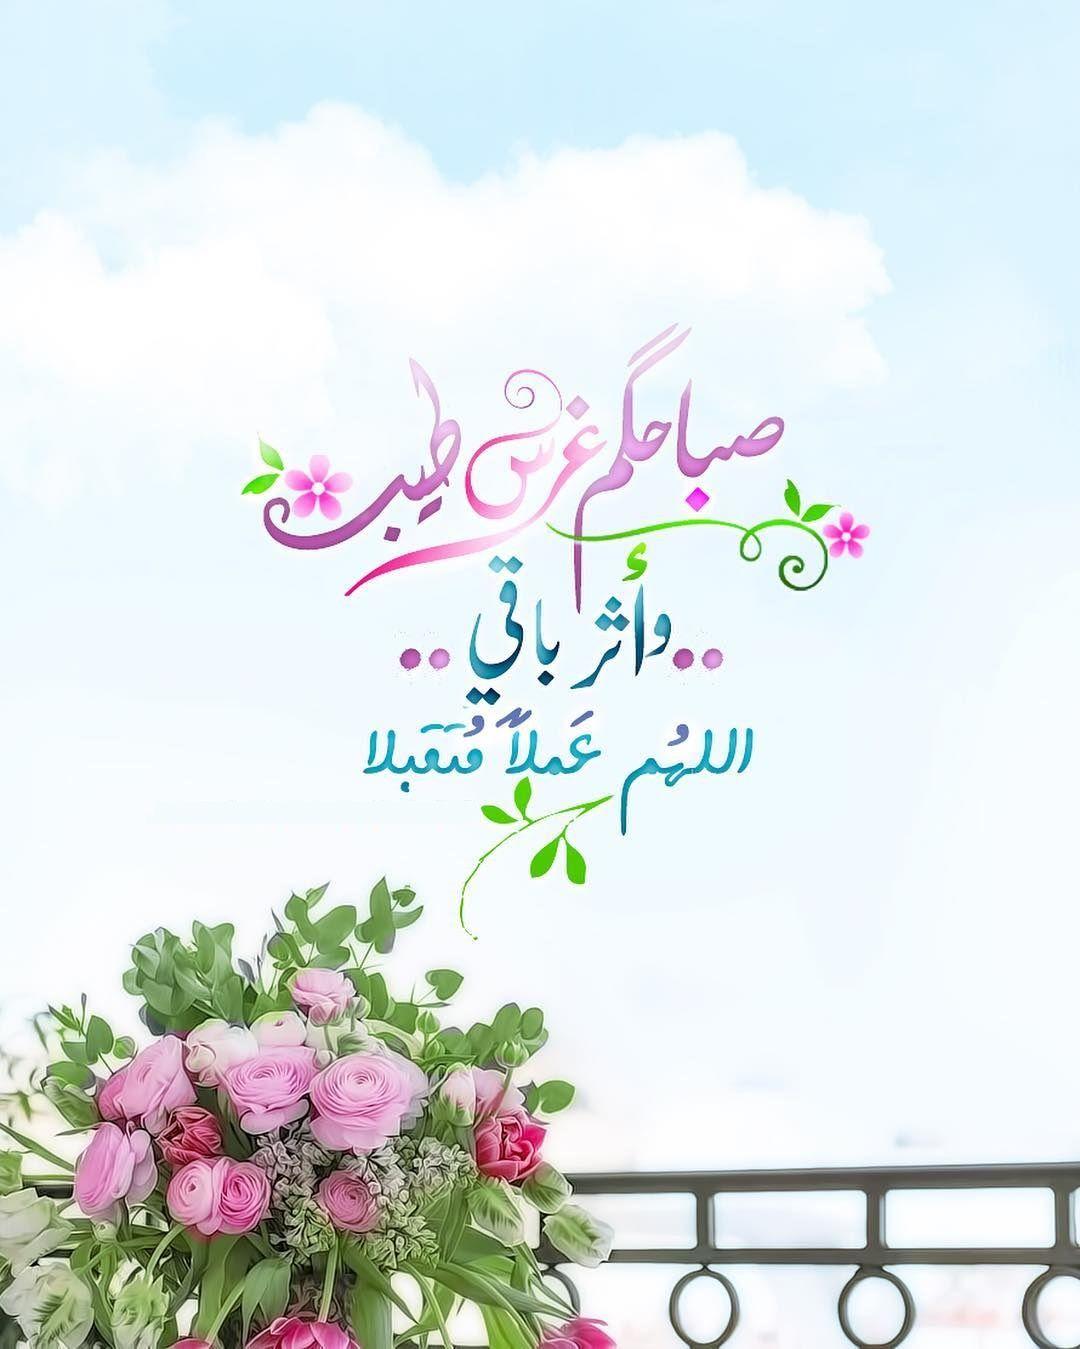 Pin By Desert Rose On بطـاقـات صبـاحيـة واسـلاميـة Beautiful Morning Messages Good Morning Arabic Morning Greeting